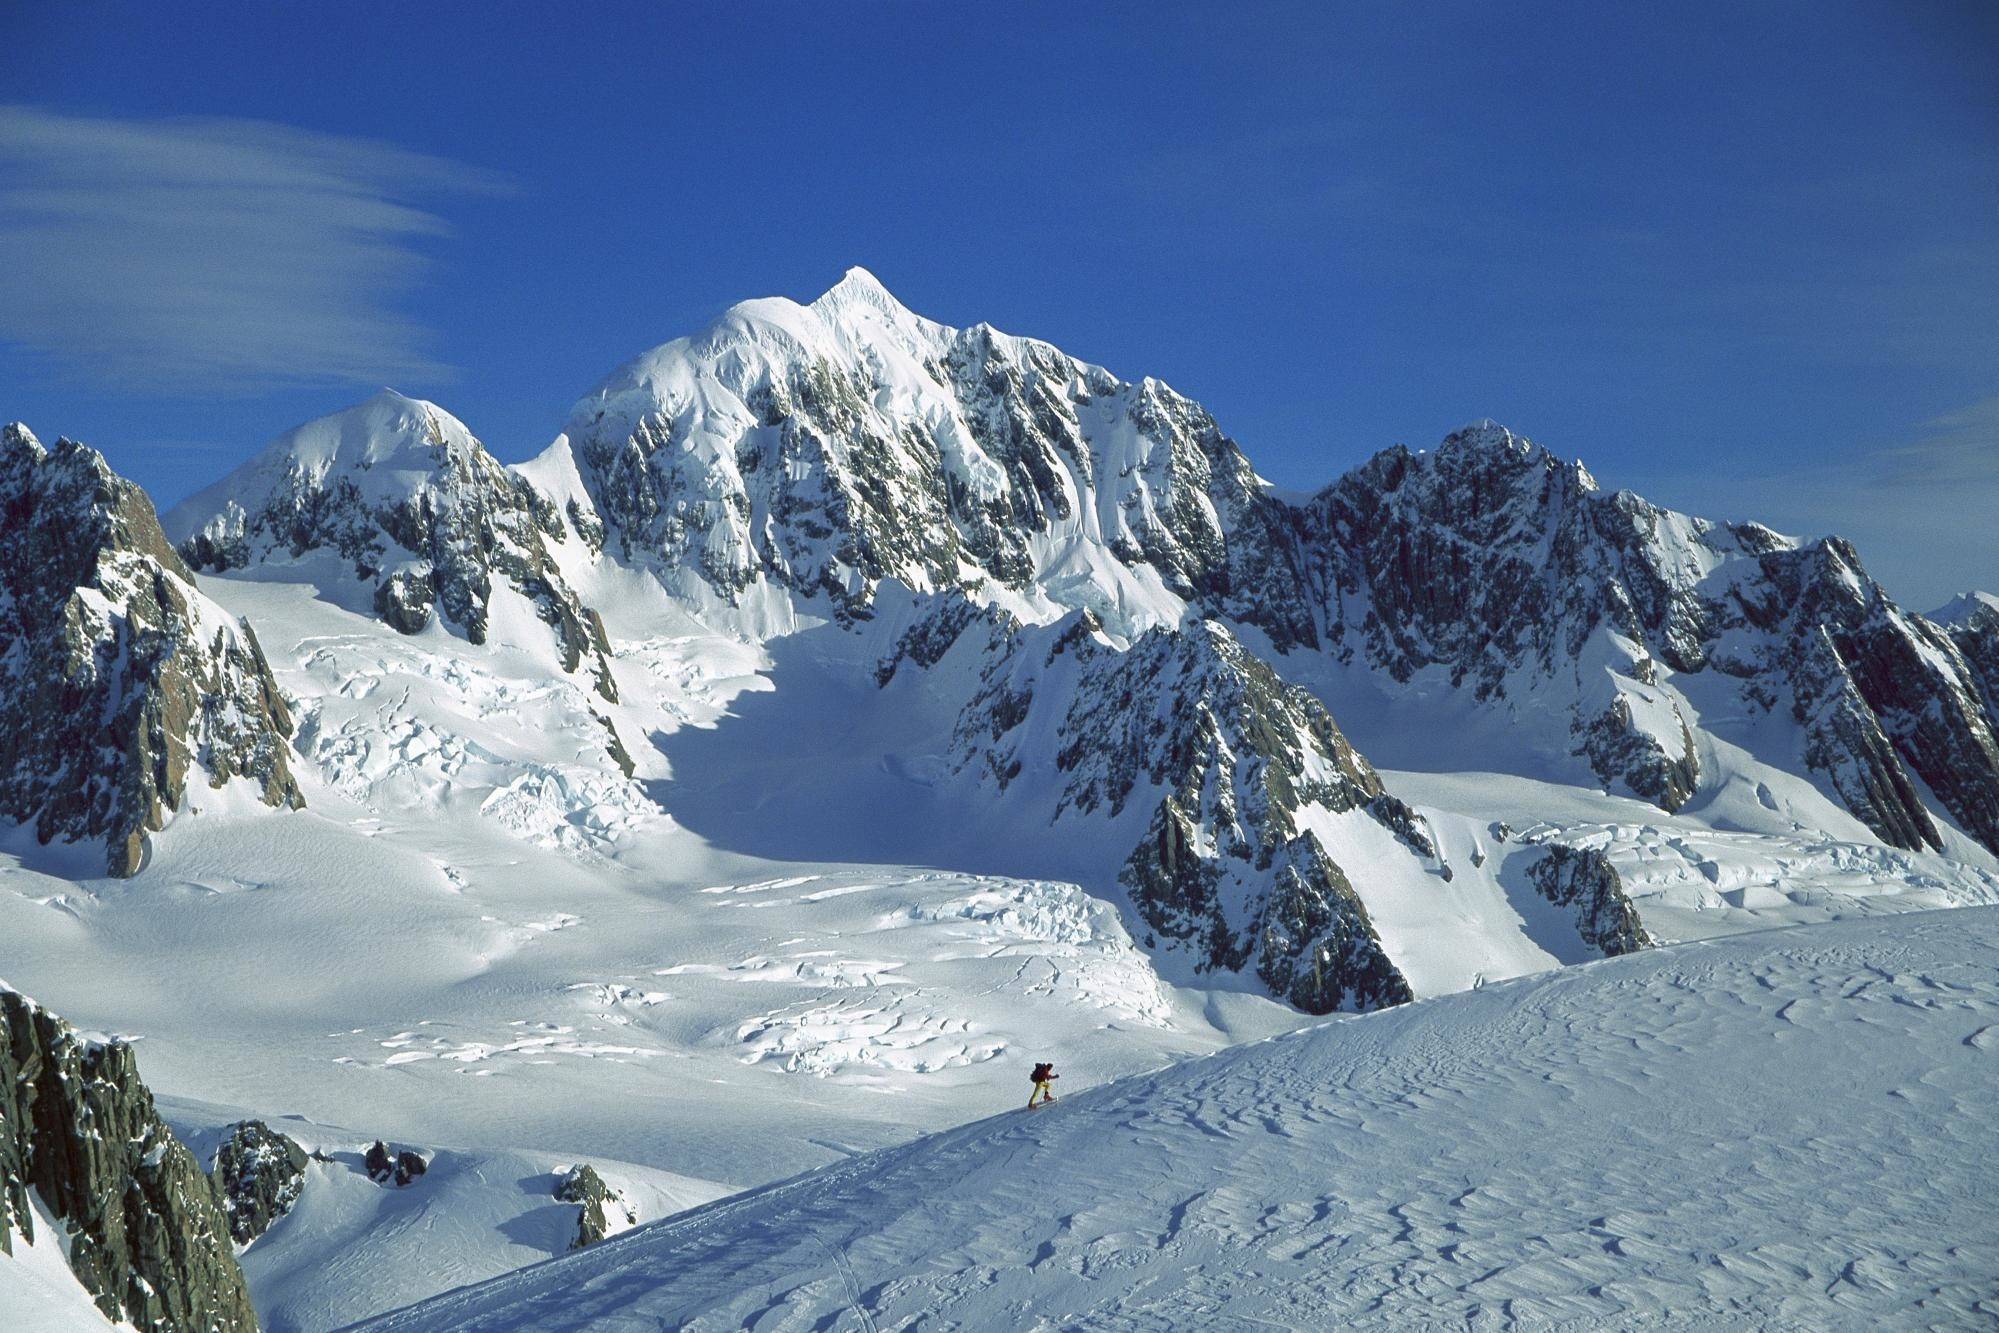 Snow Winter Mountain Wallpaper | Wallpaper Download